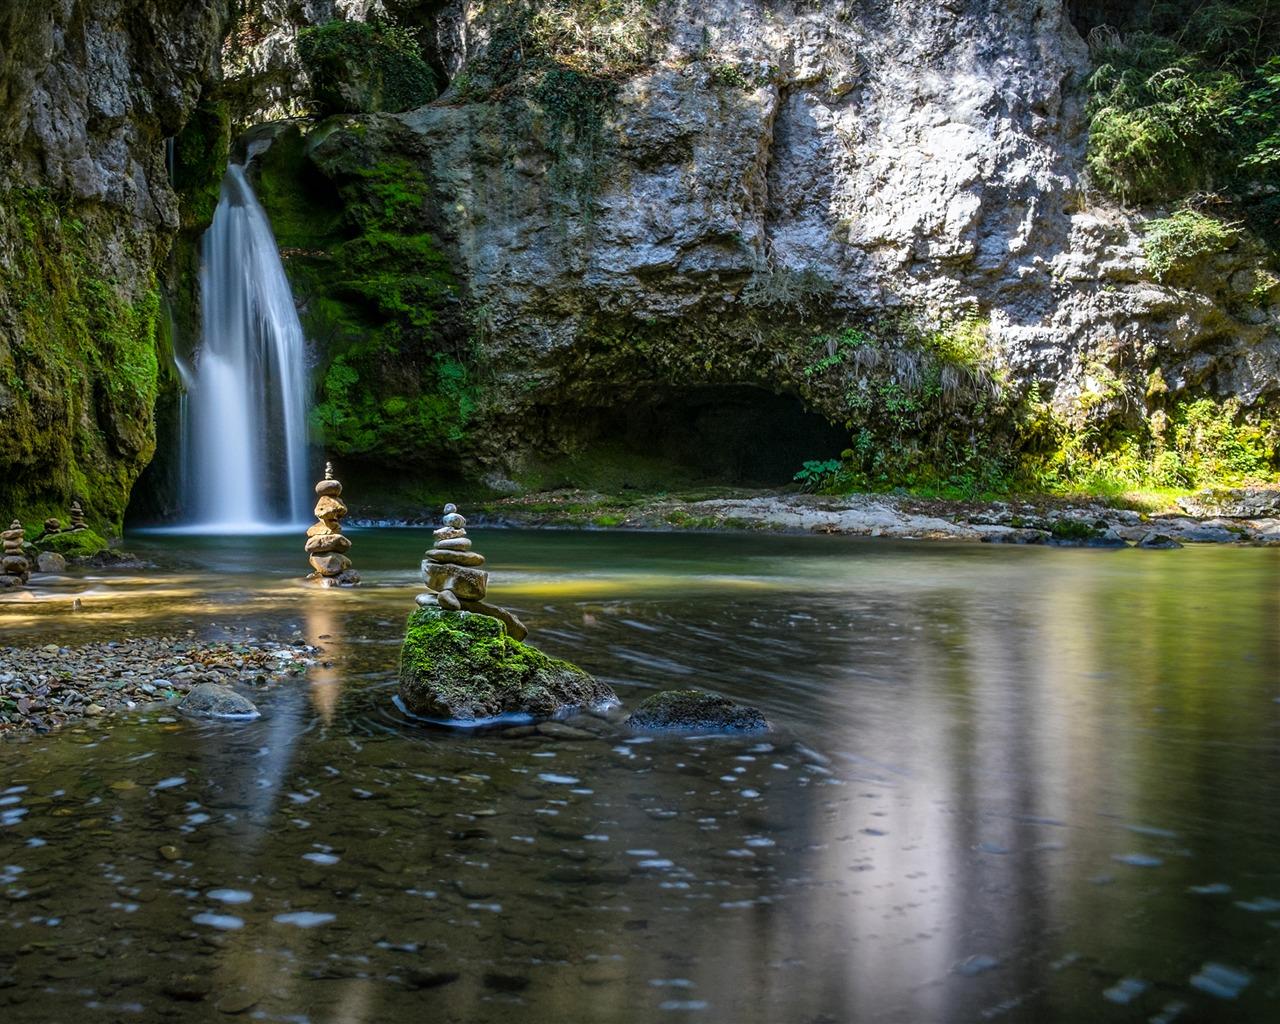 Jungle Waterfall Wallpaper Hd: Jungle Waterfall River Summer Sunshine 4K Ultra HD